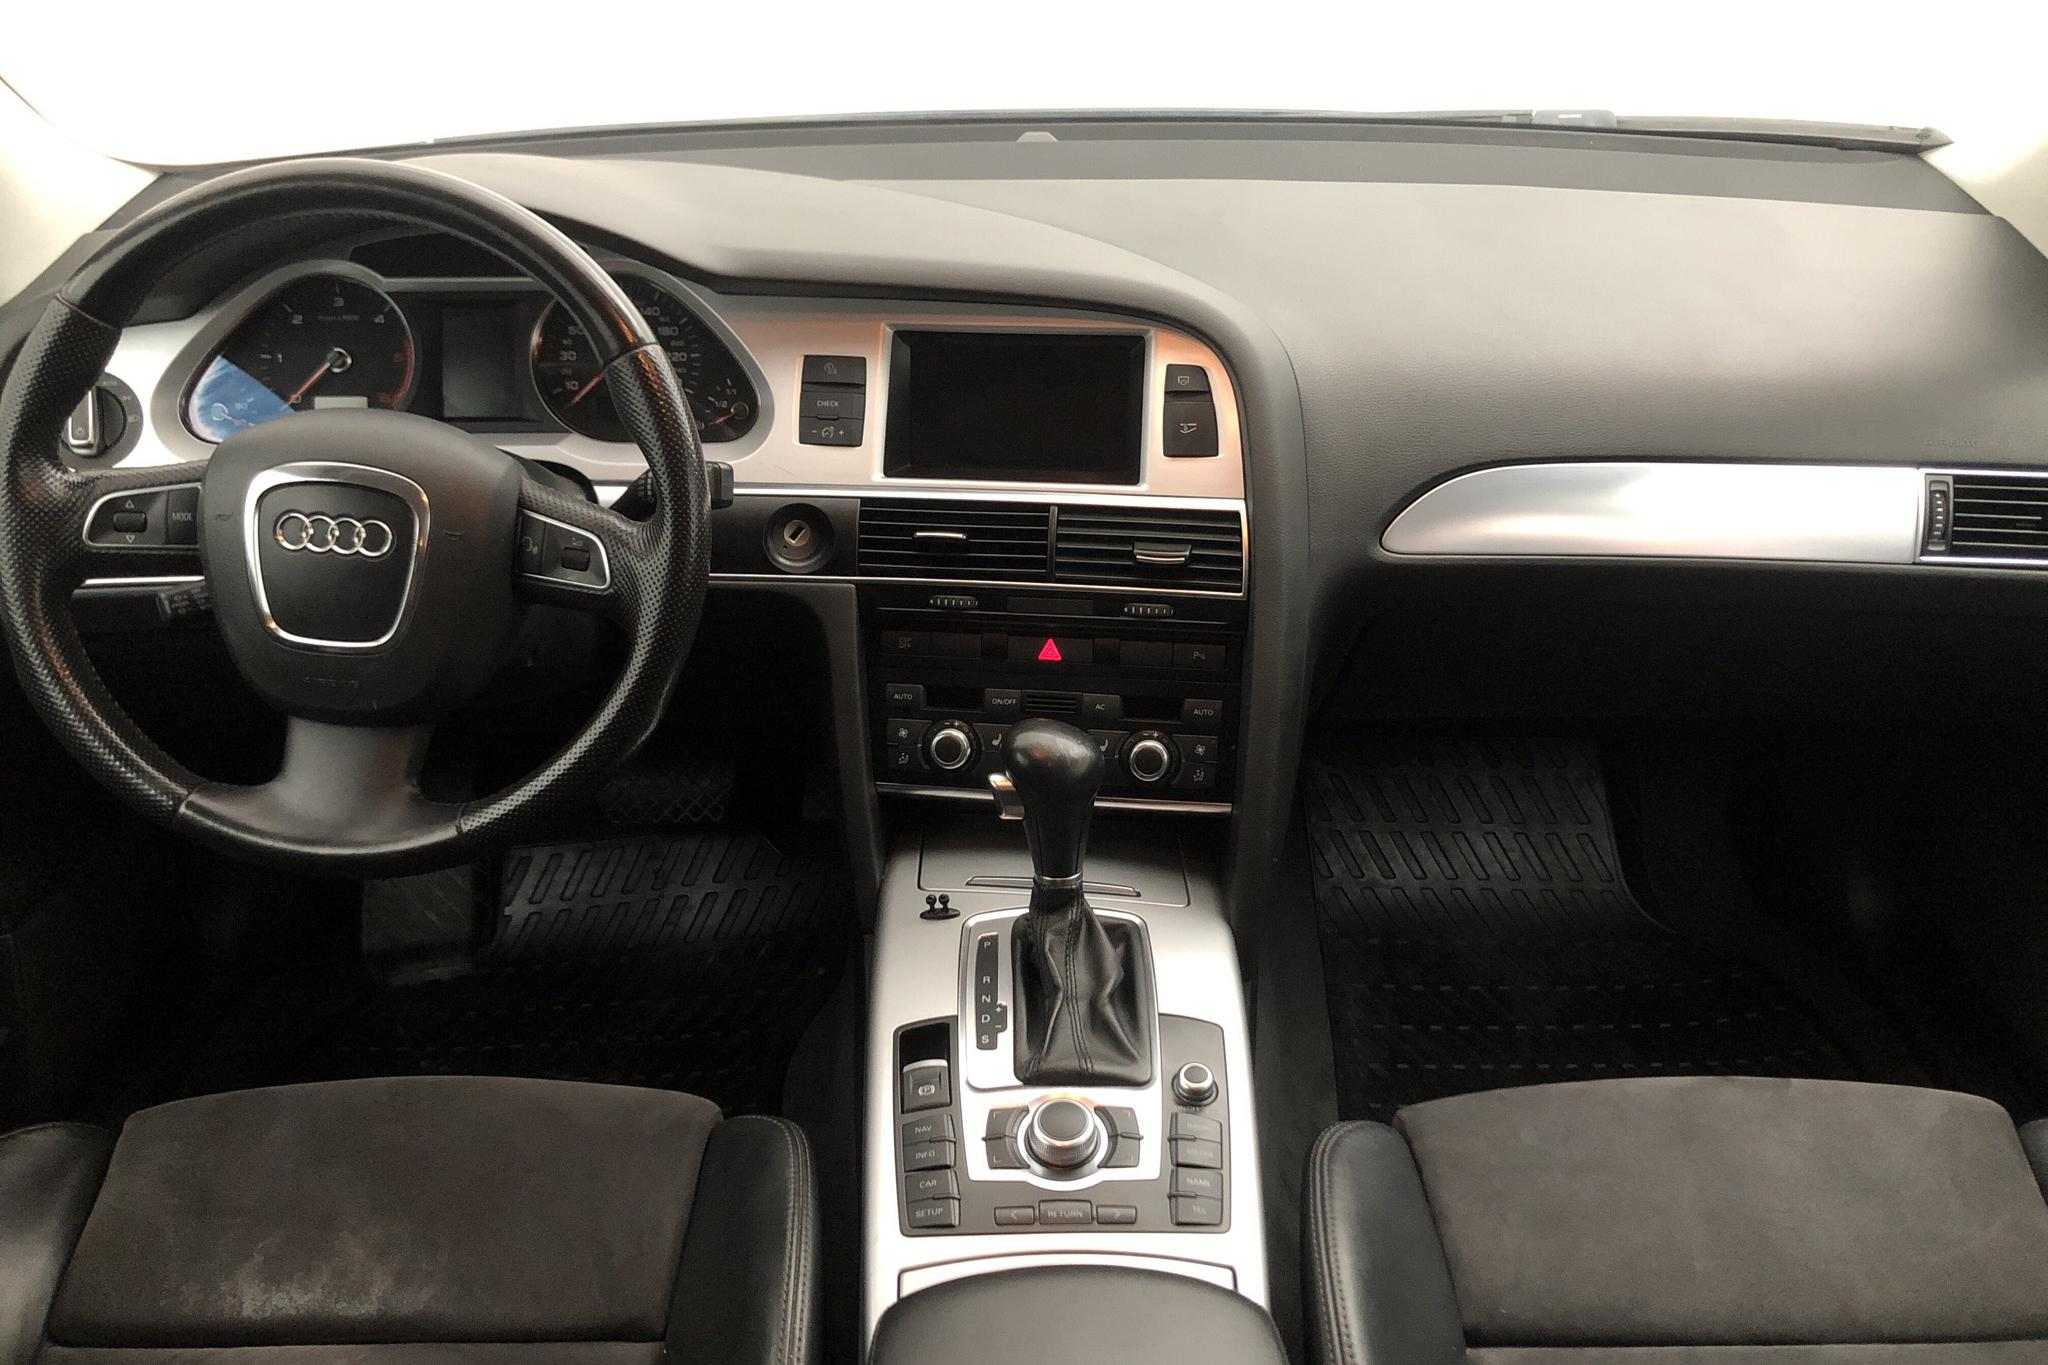 Audi A6 2.0 TDI Avant (170hk) - 259 140 km - Automatic - black - 2011